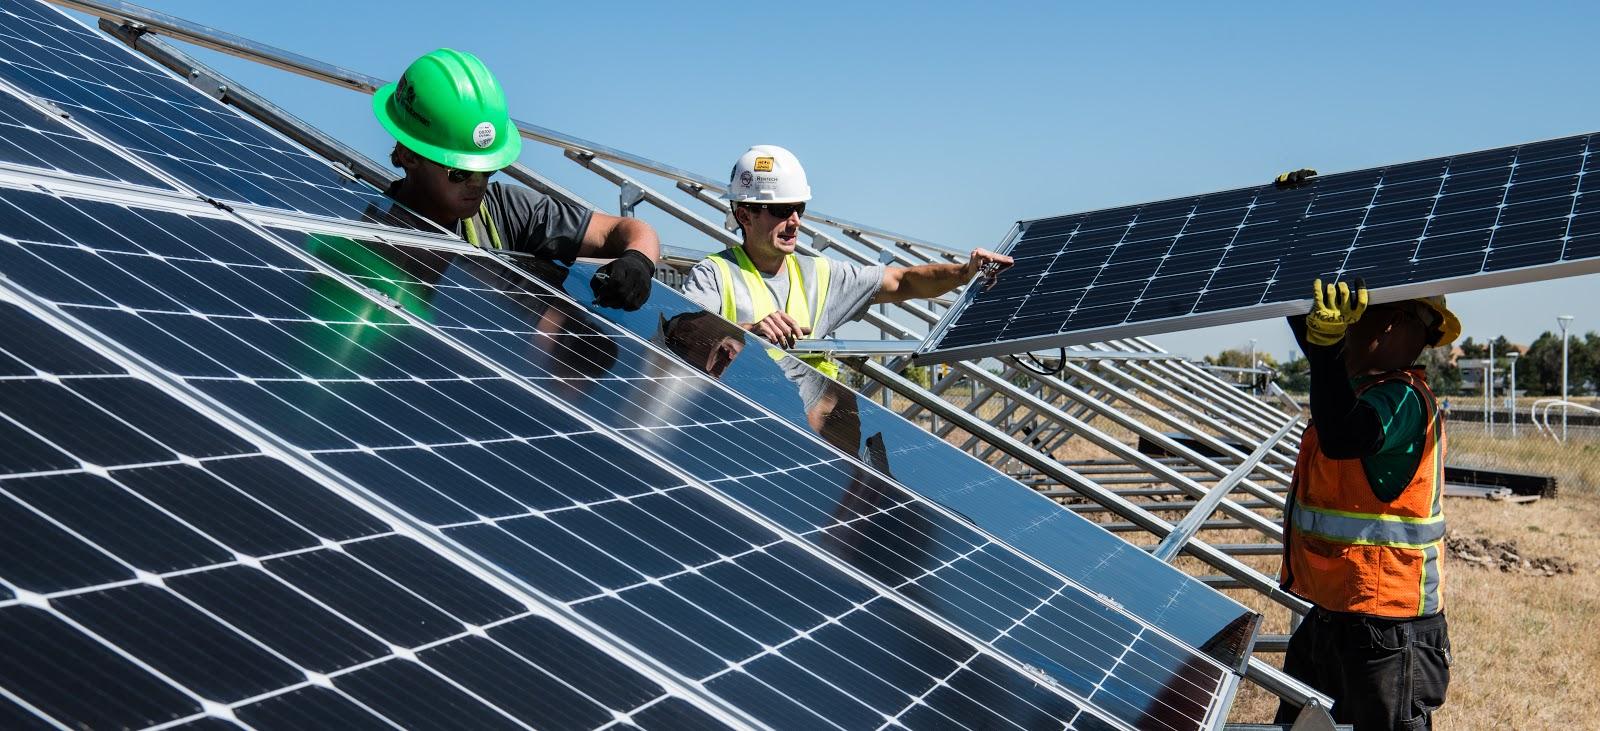 Renewable energy - solar panels